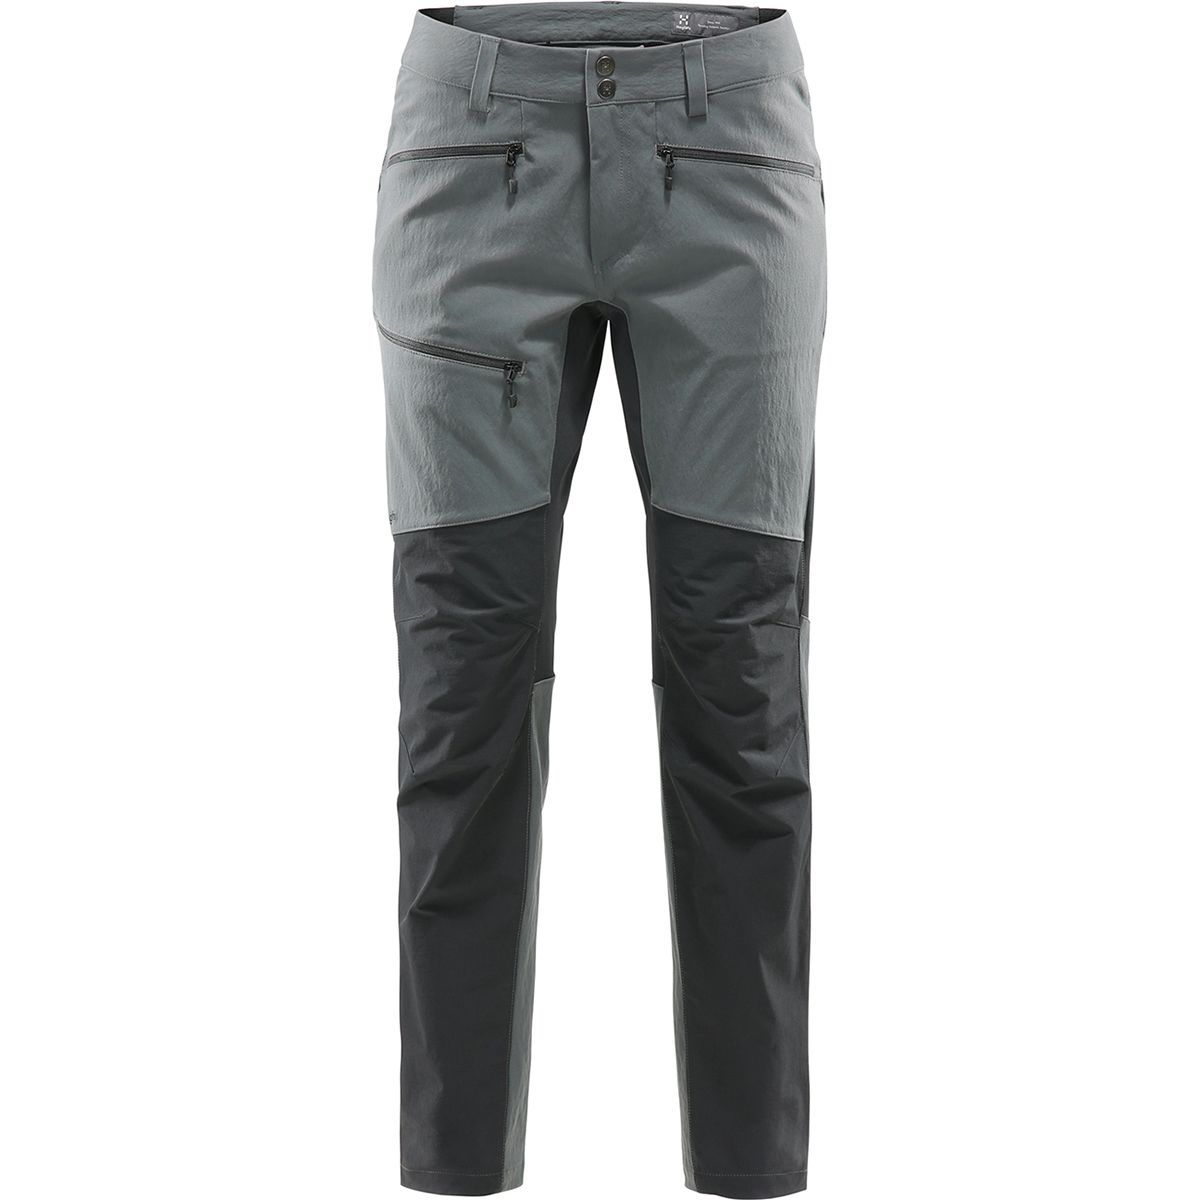 Photo of Haglofs Rugged Flex Pant – Men's